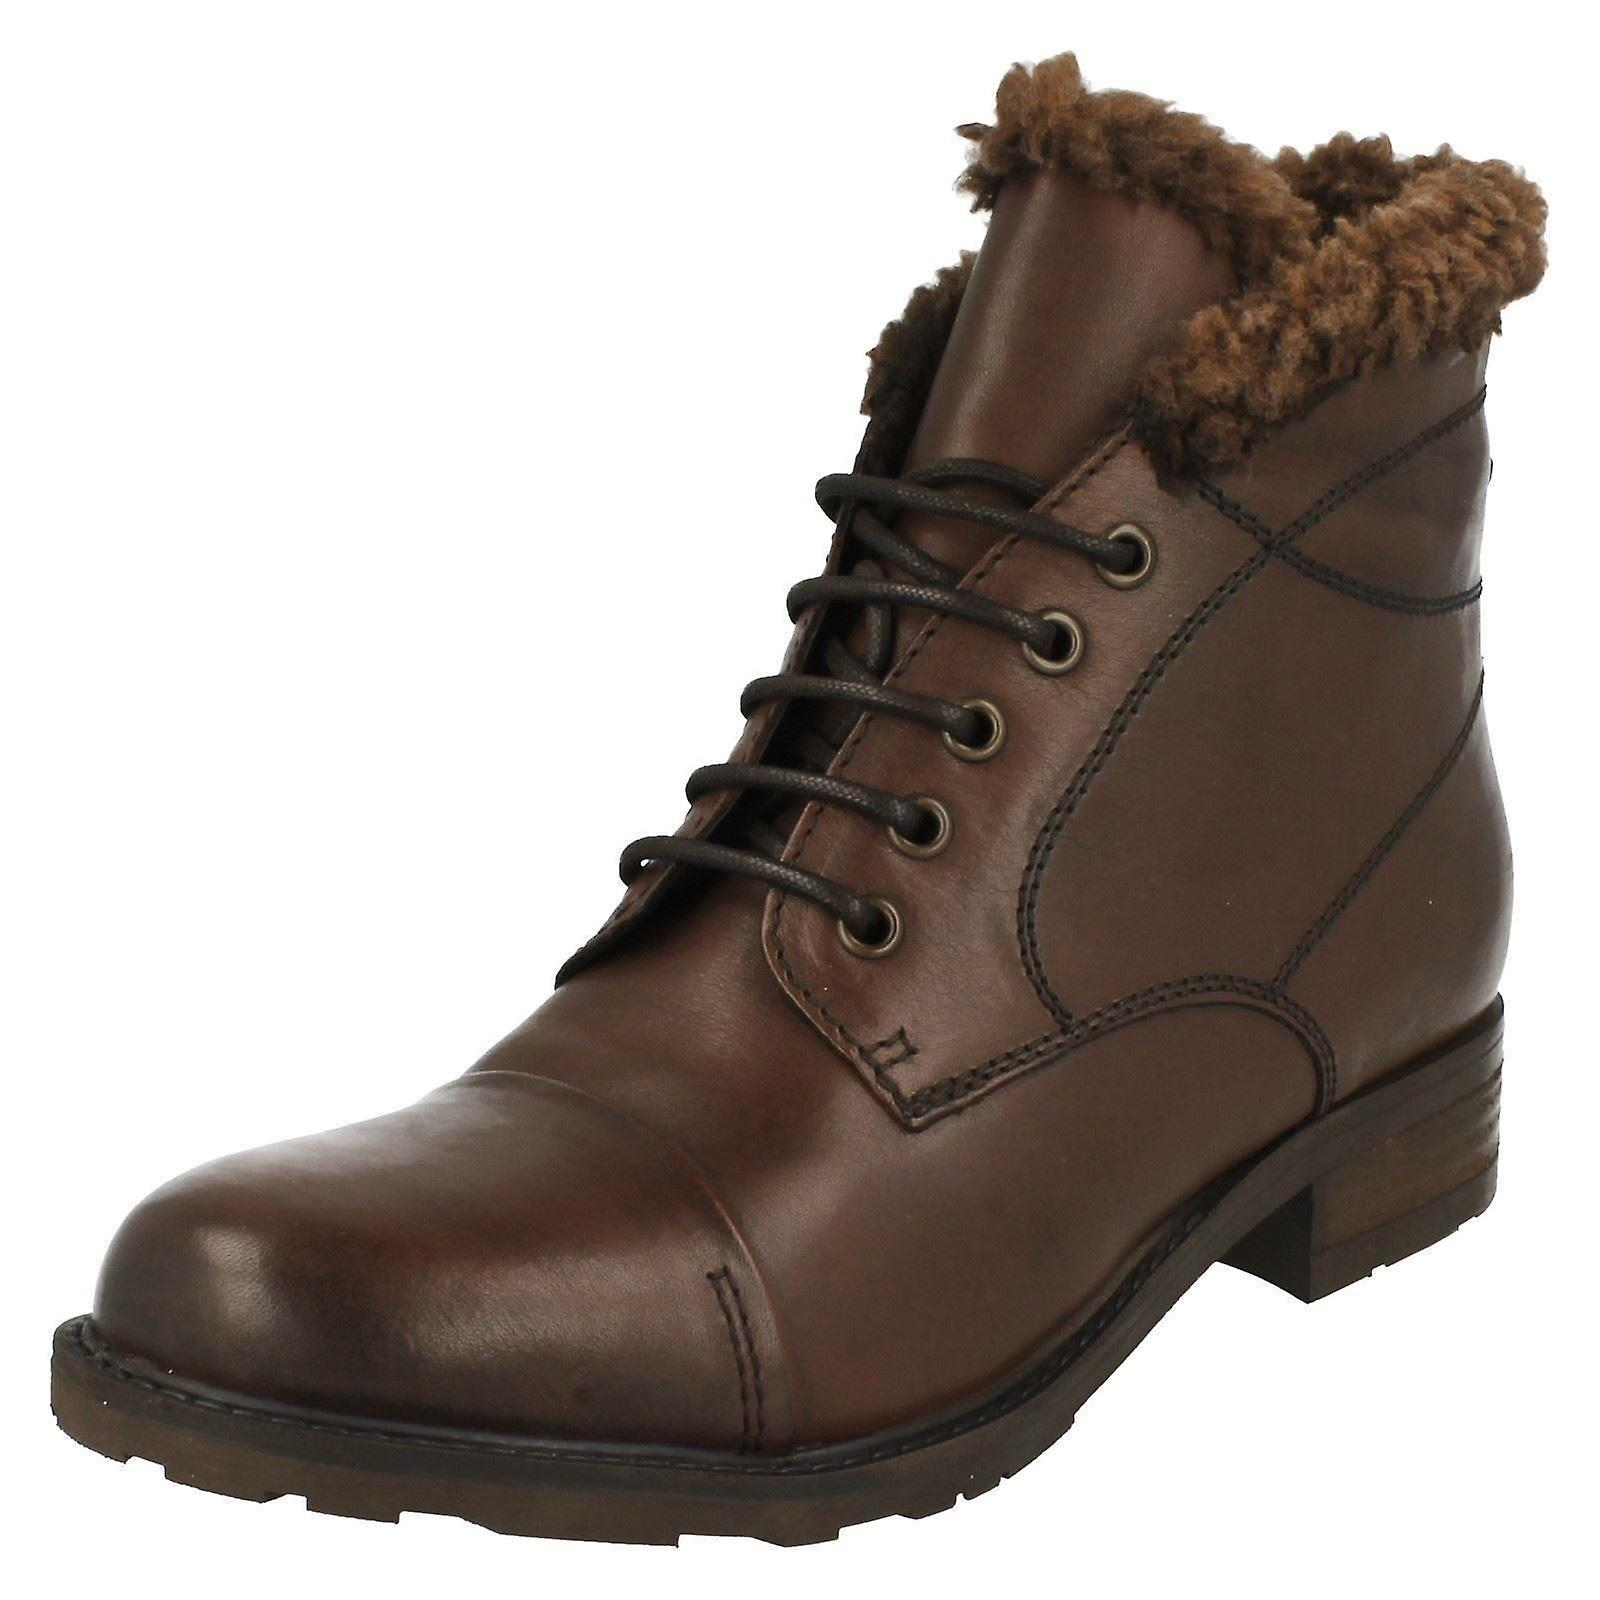 Ladies Clarks Fashion Ankle Boots Hayride Elm oCfWK